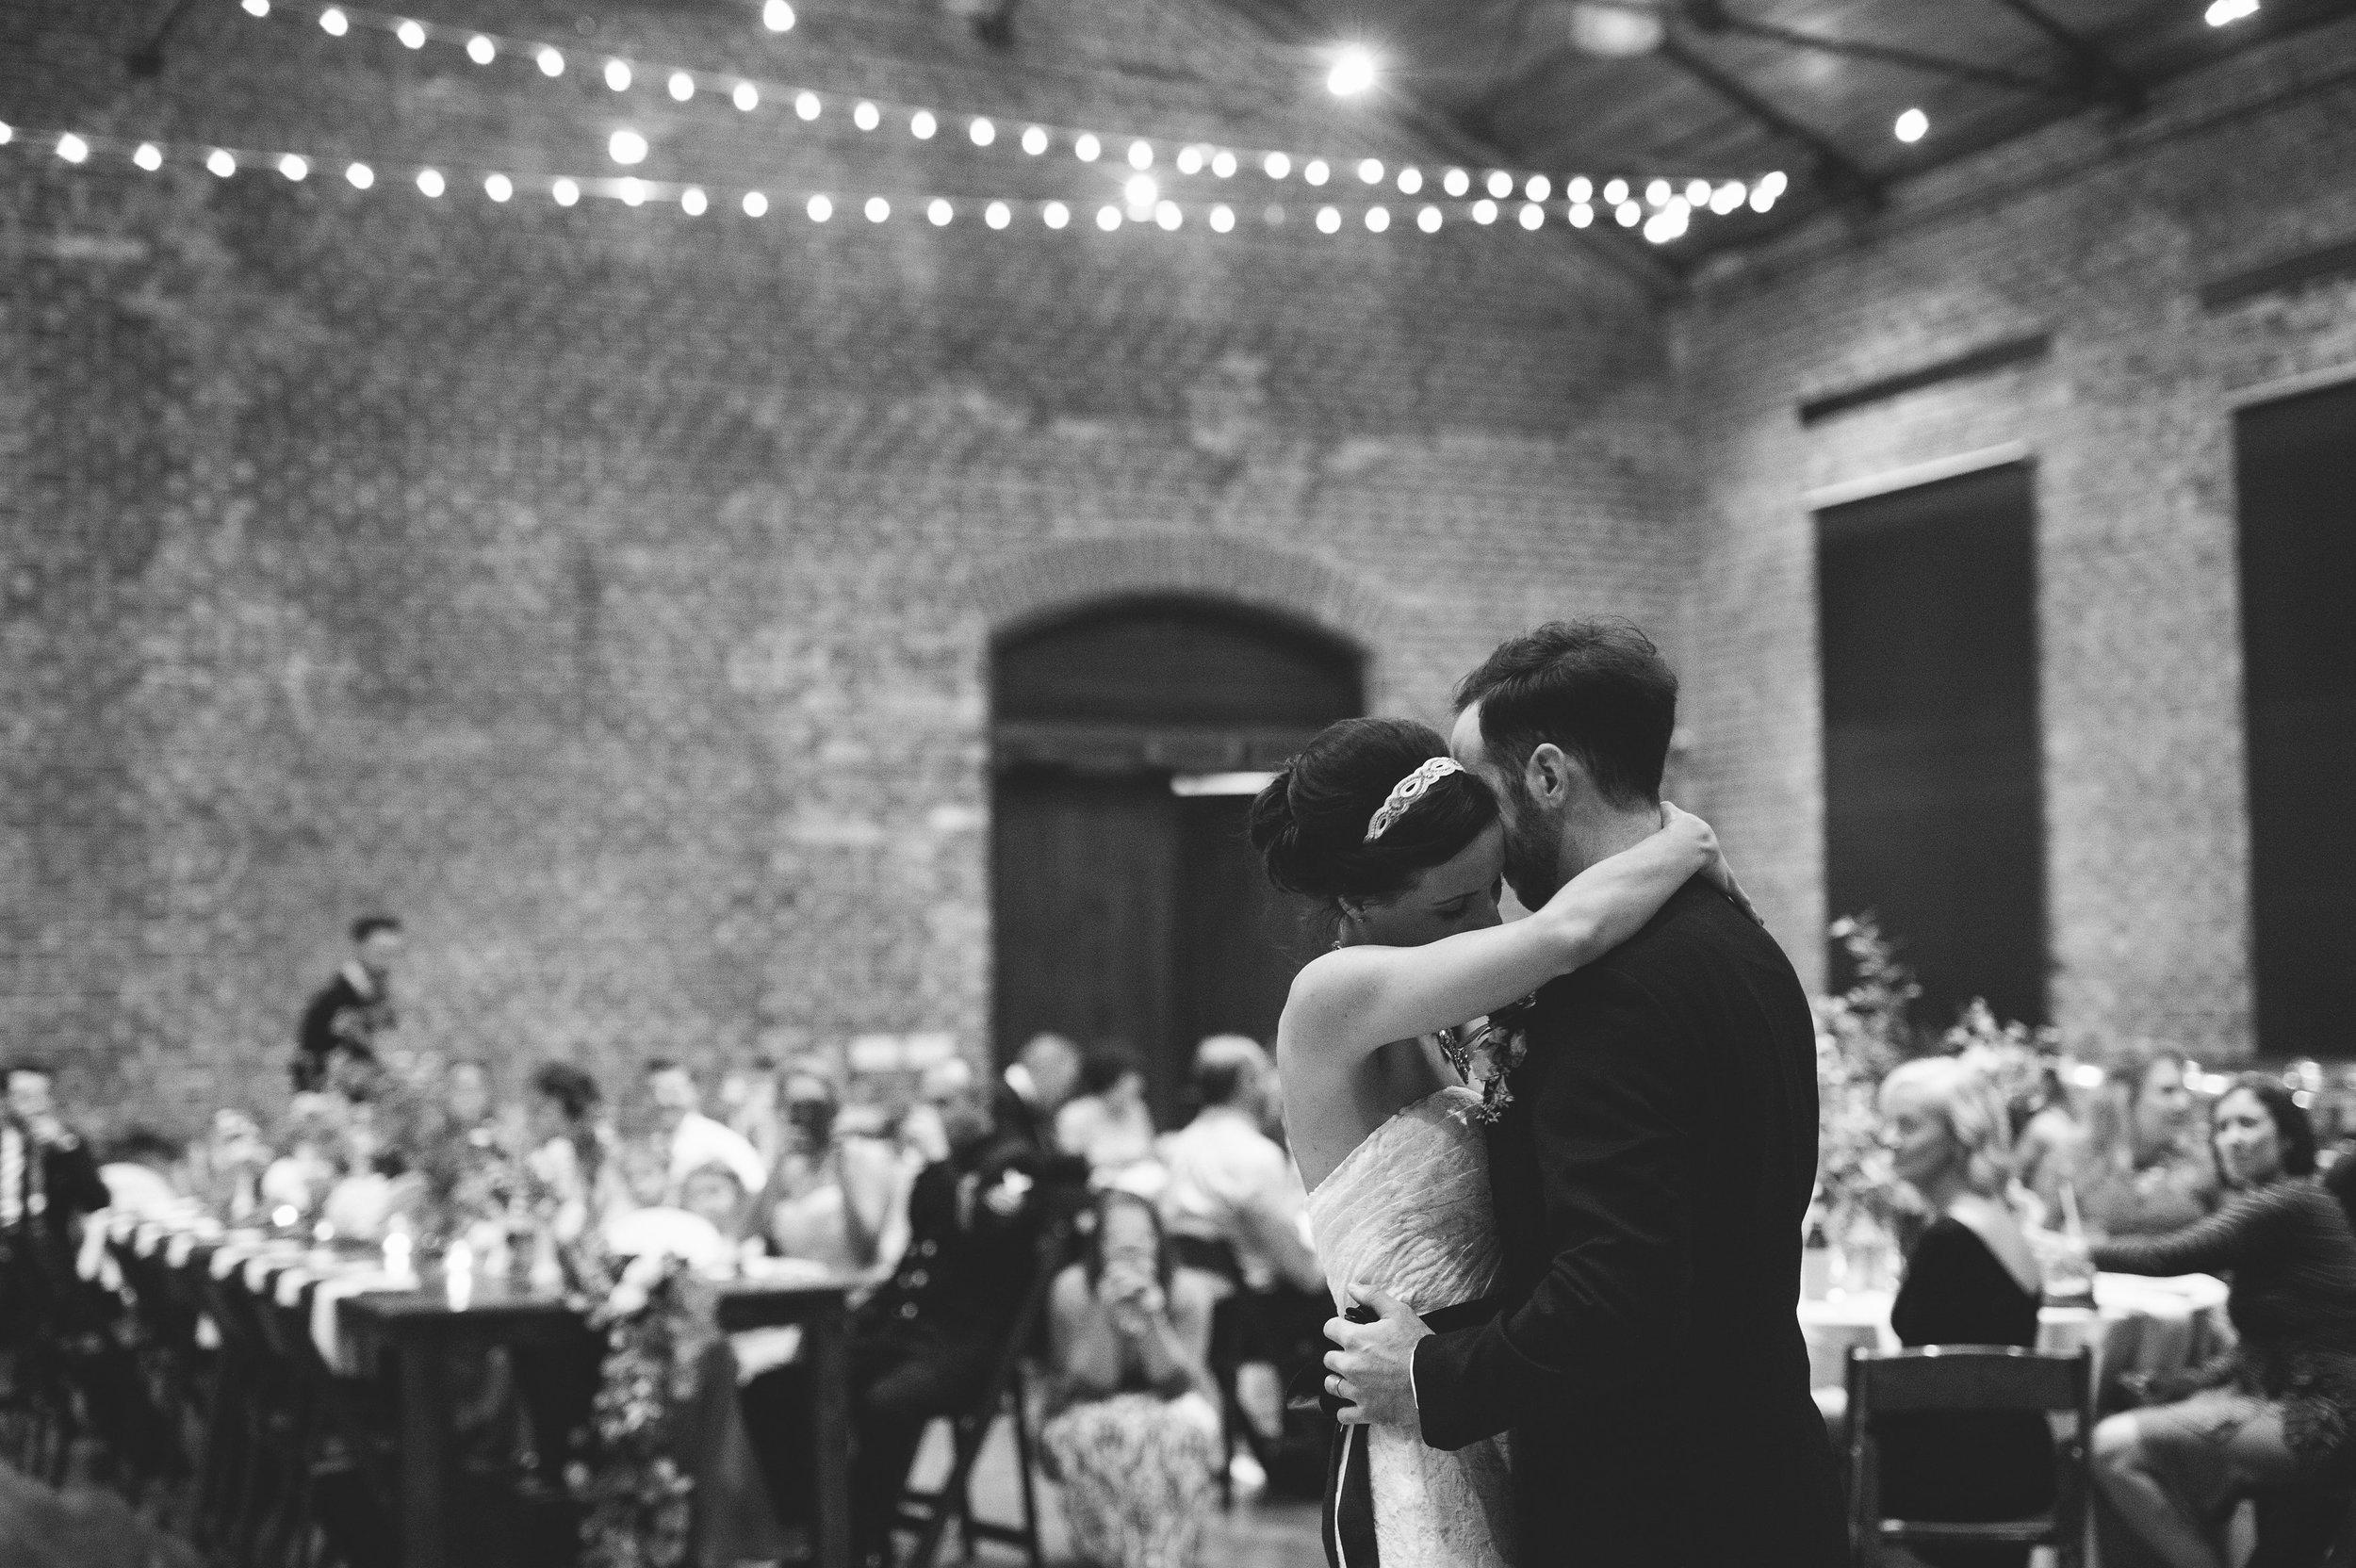 amber-and-paul-rach-loves-troy-charles-h-morris-center-wedding-sarah-seven-helene-lace-wedding-dress-ivory-and-beau-bridal-boutique-savannah-wedding-planner-savannah-event-designer-savannah-florist-savannah-weddings-savannah-bridal-boutique-41.jpg